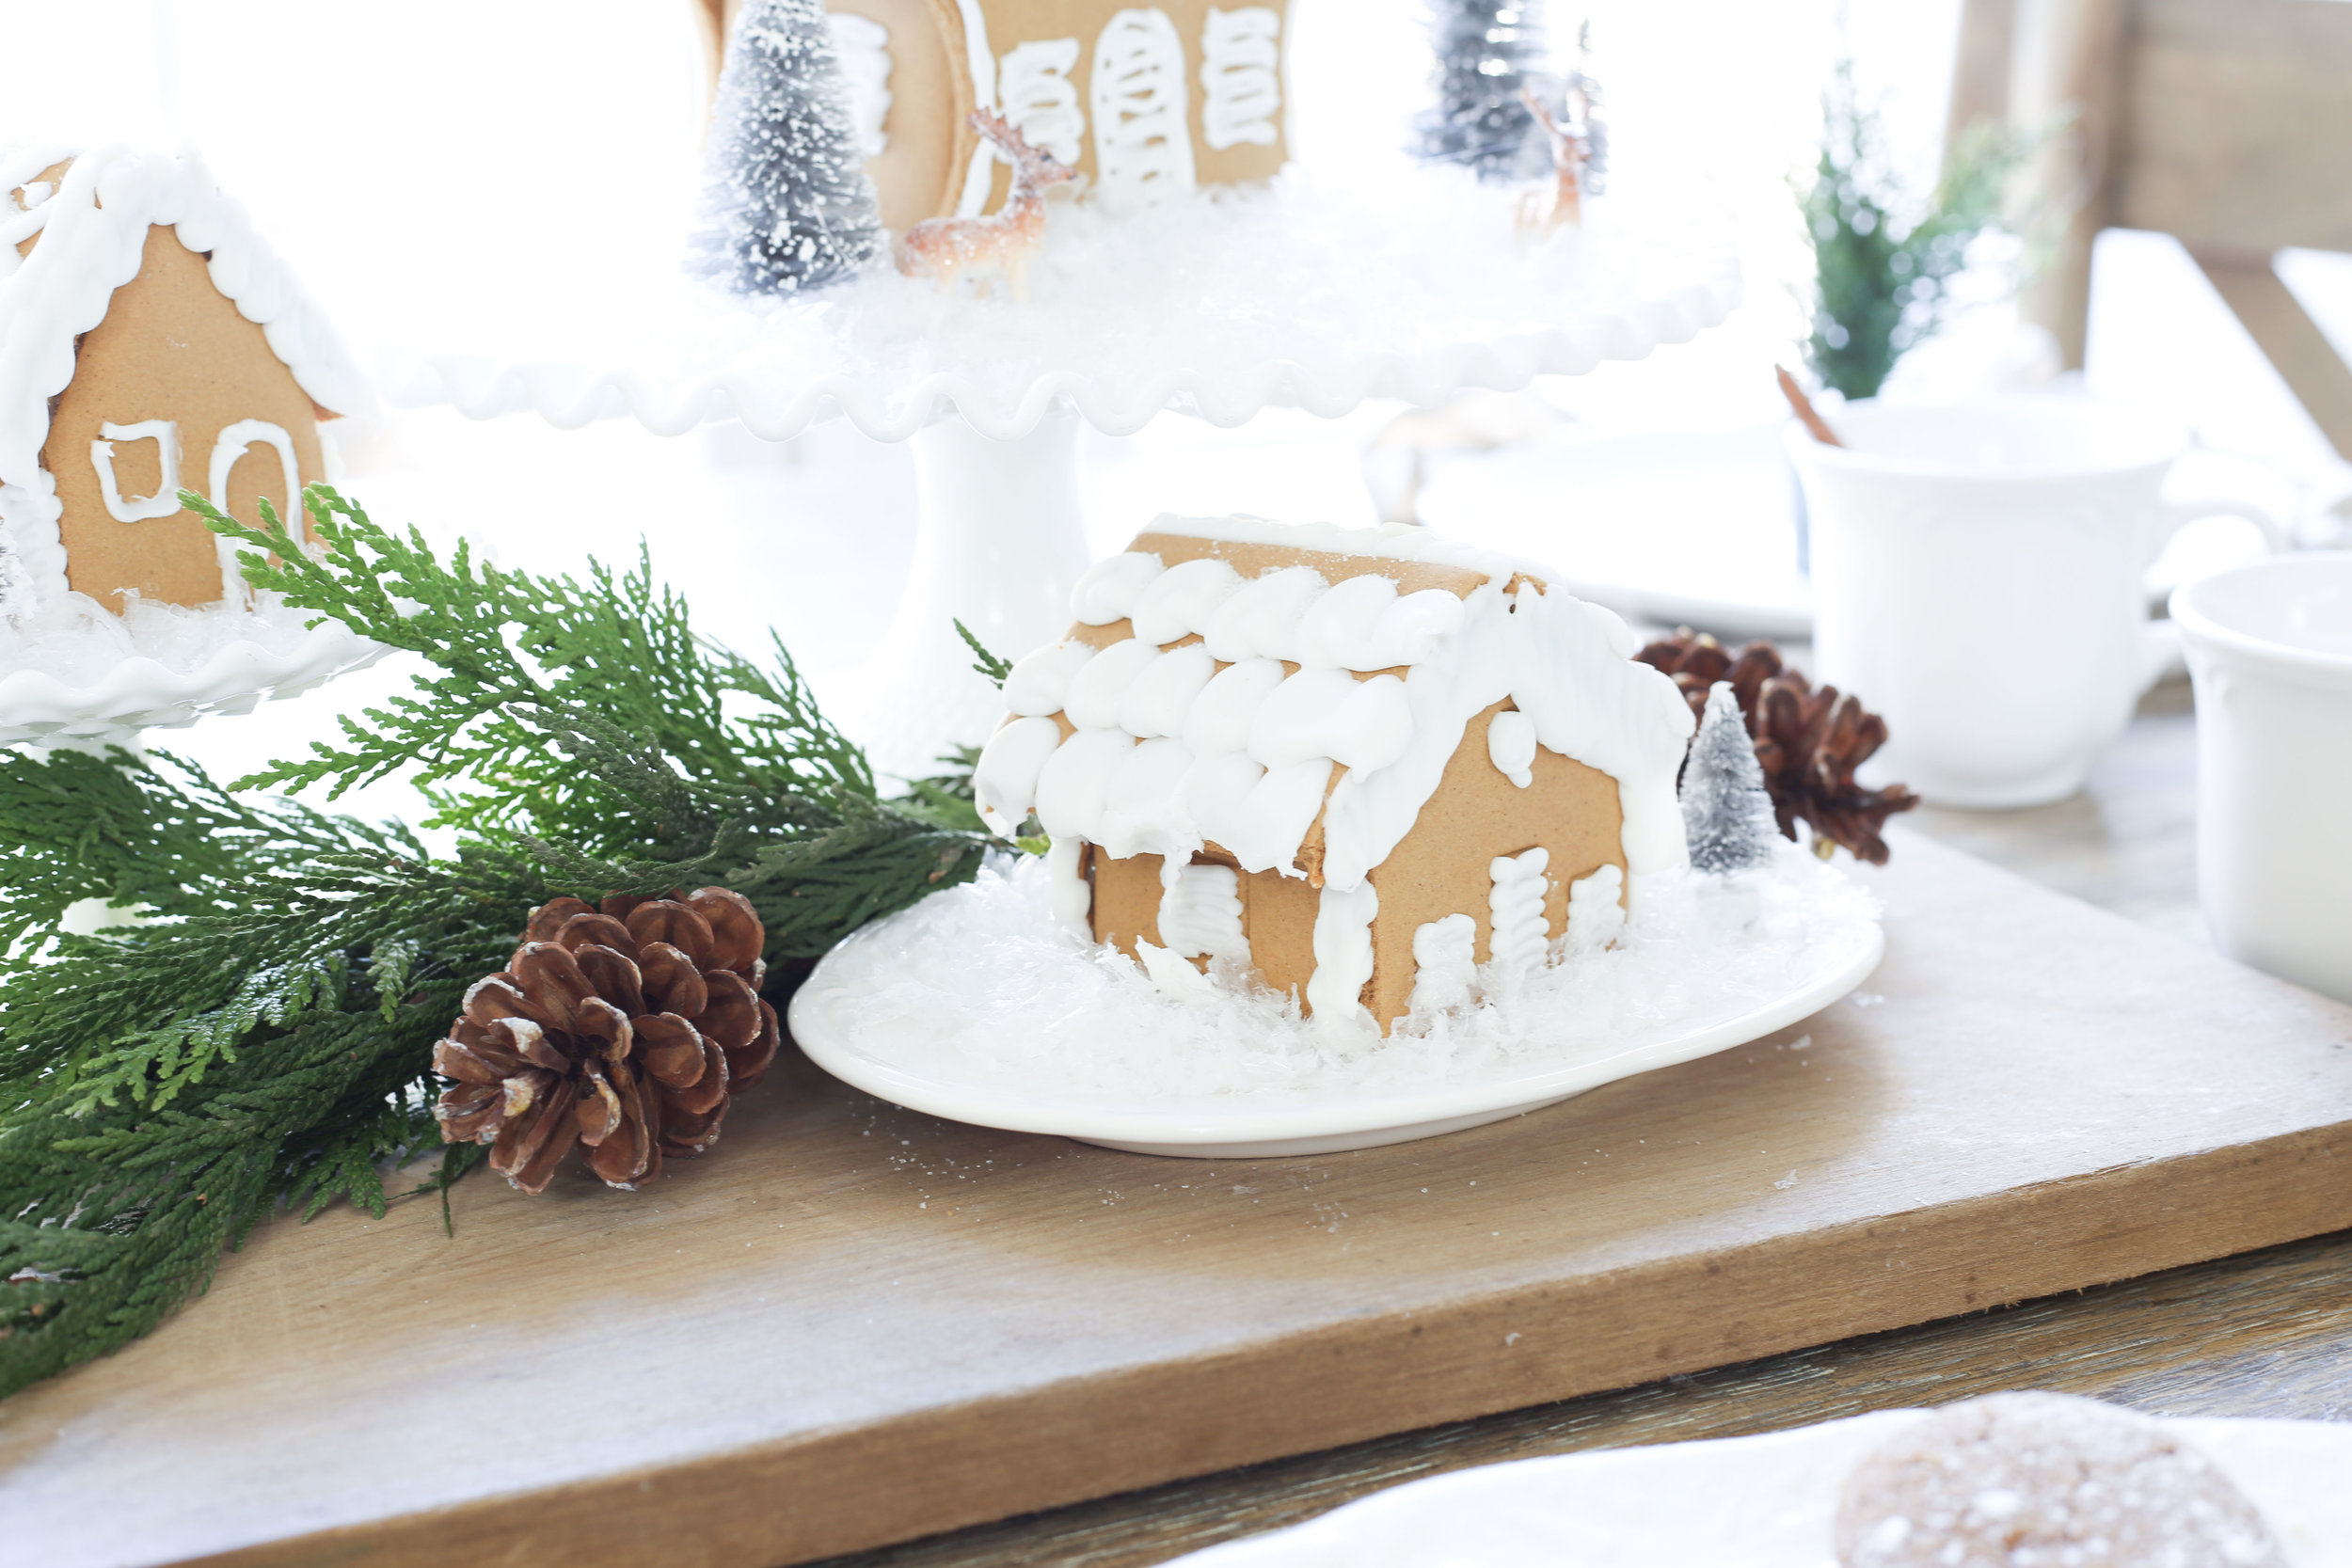 Christmas 2017 Home Tour: Deck The Blogs- Decorating With Gingerbread Houses- Plum Pretty Decor & Design's Christmas Home Tour